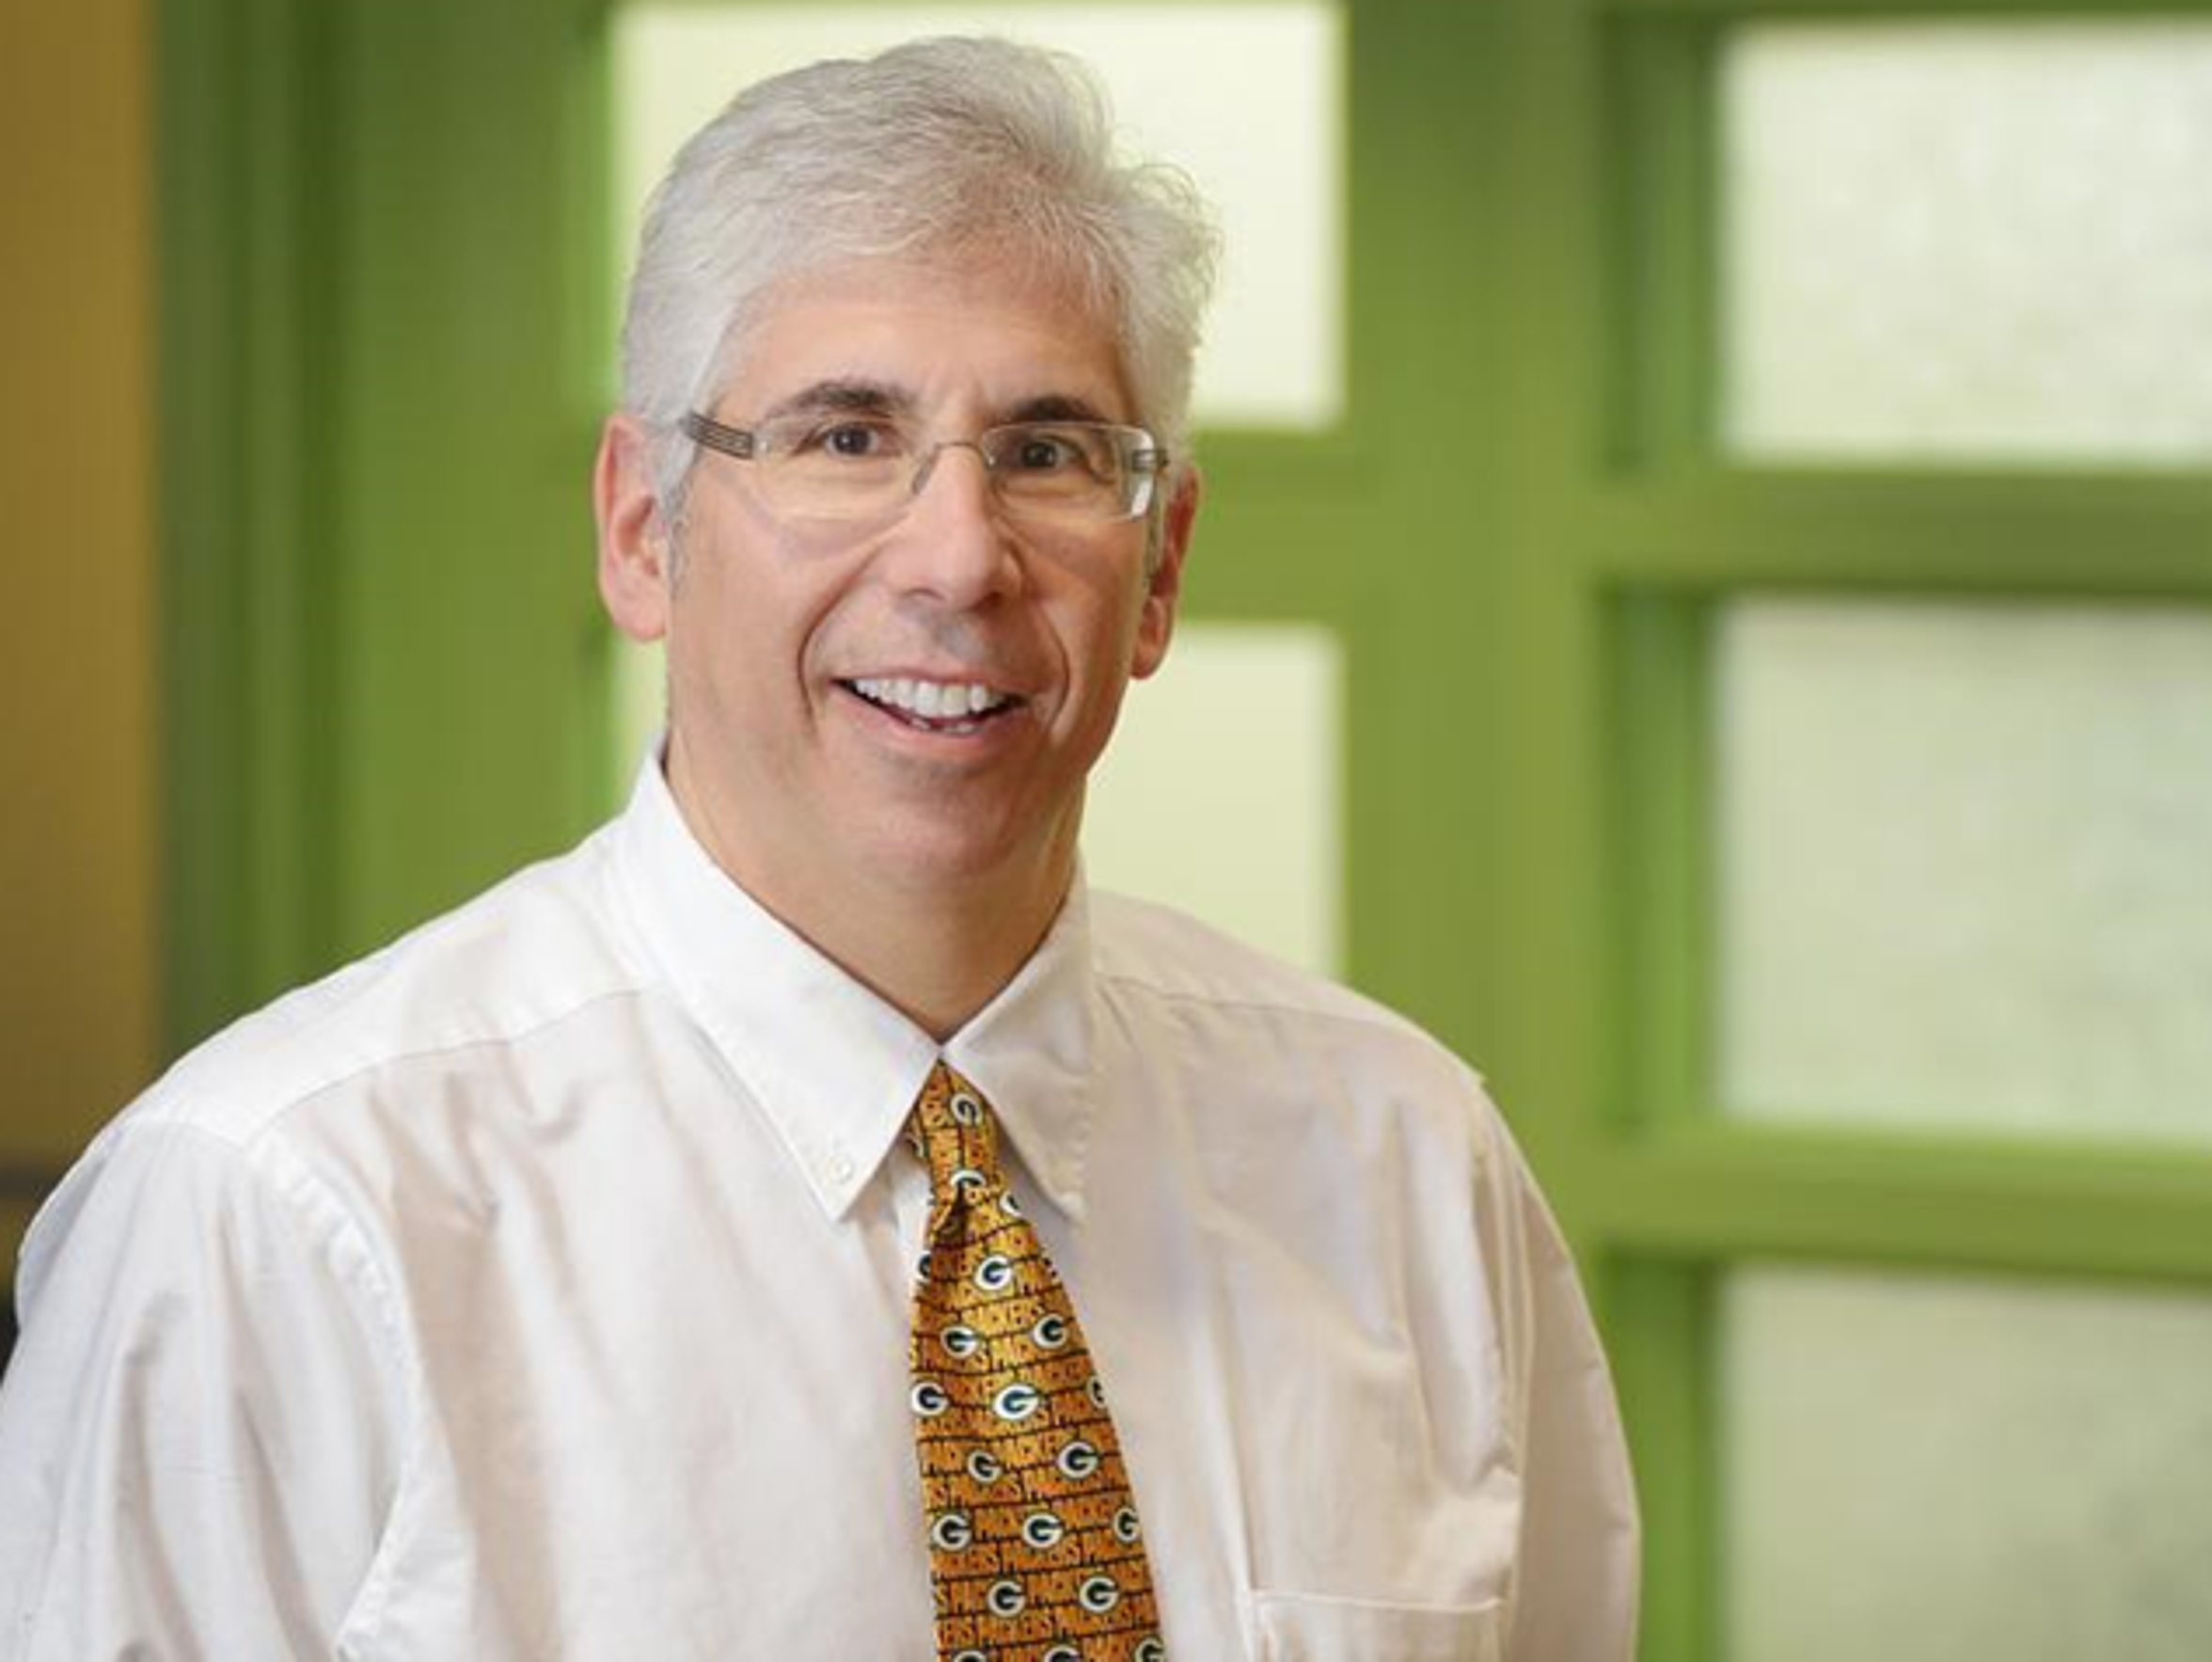 Dr. David Margolis is director of the bone marrow transplant